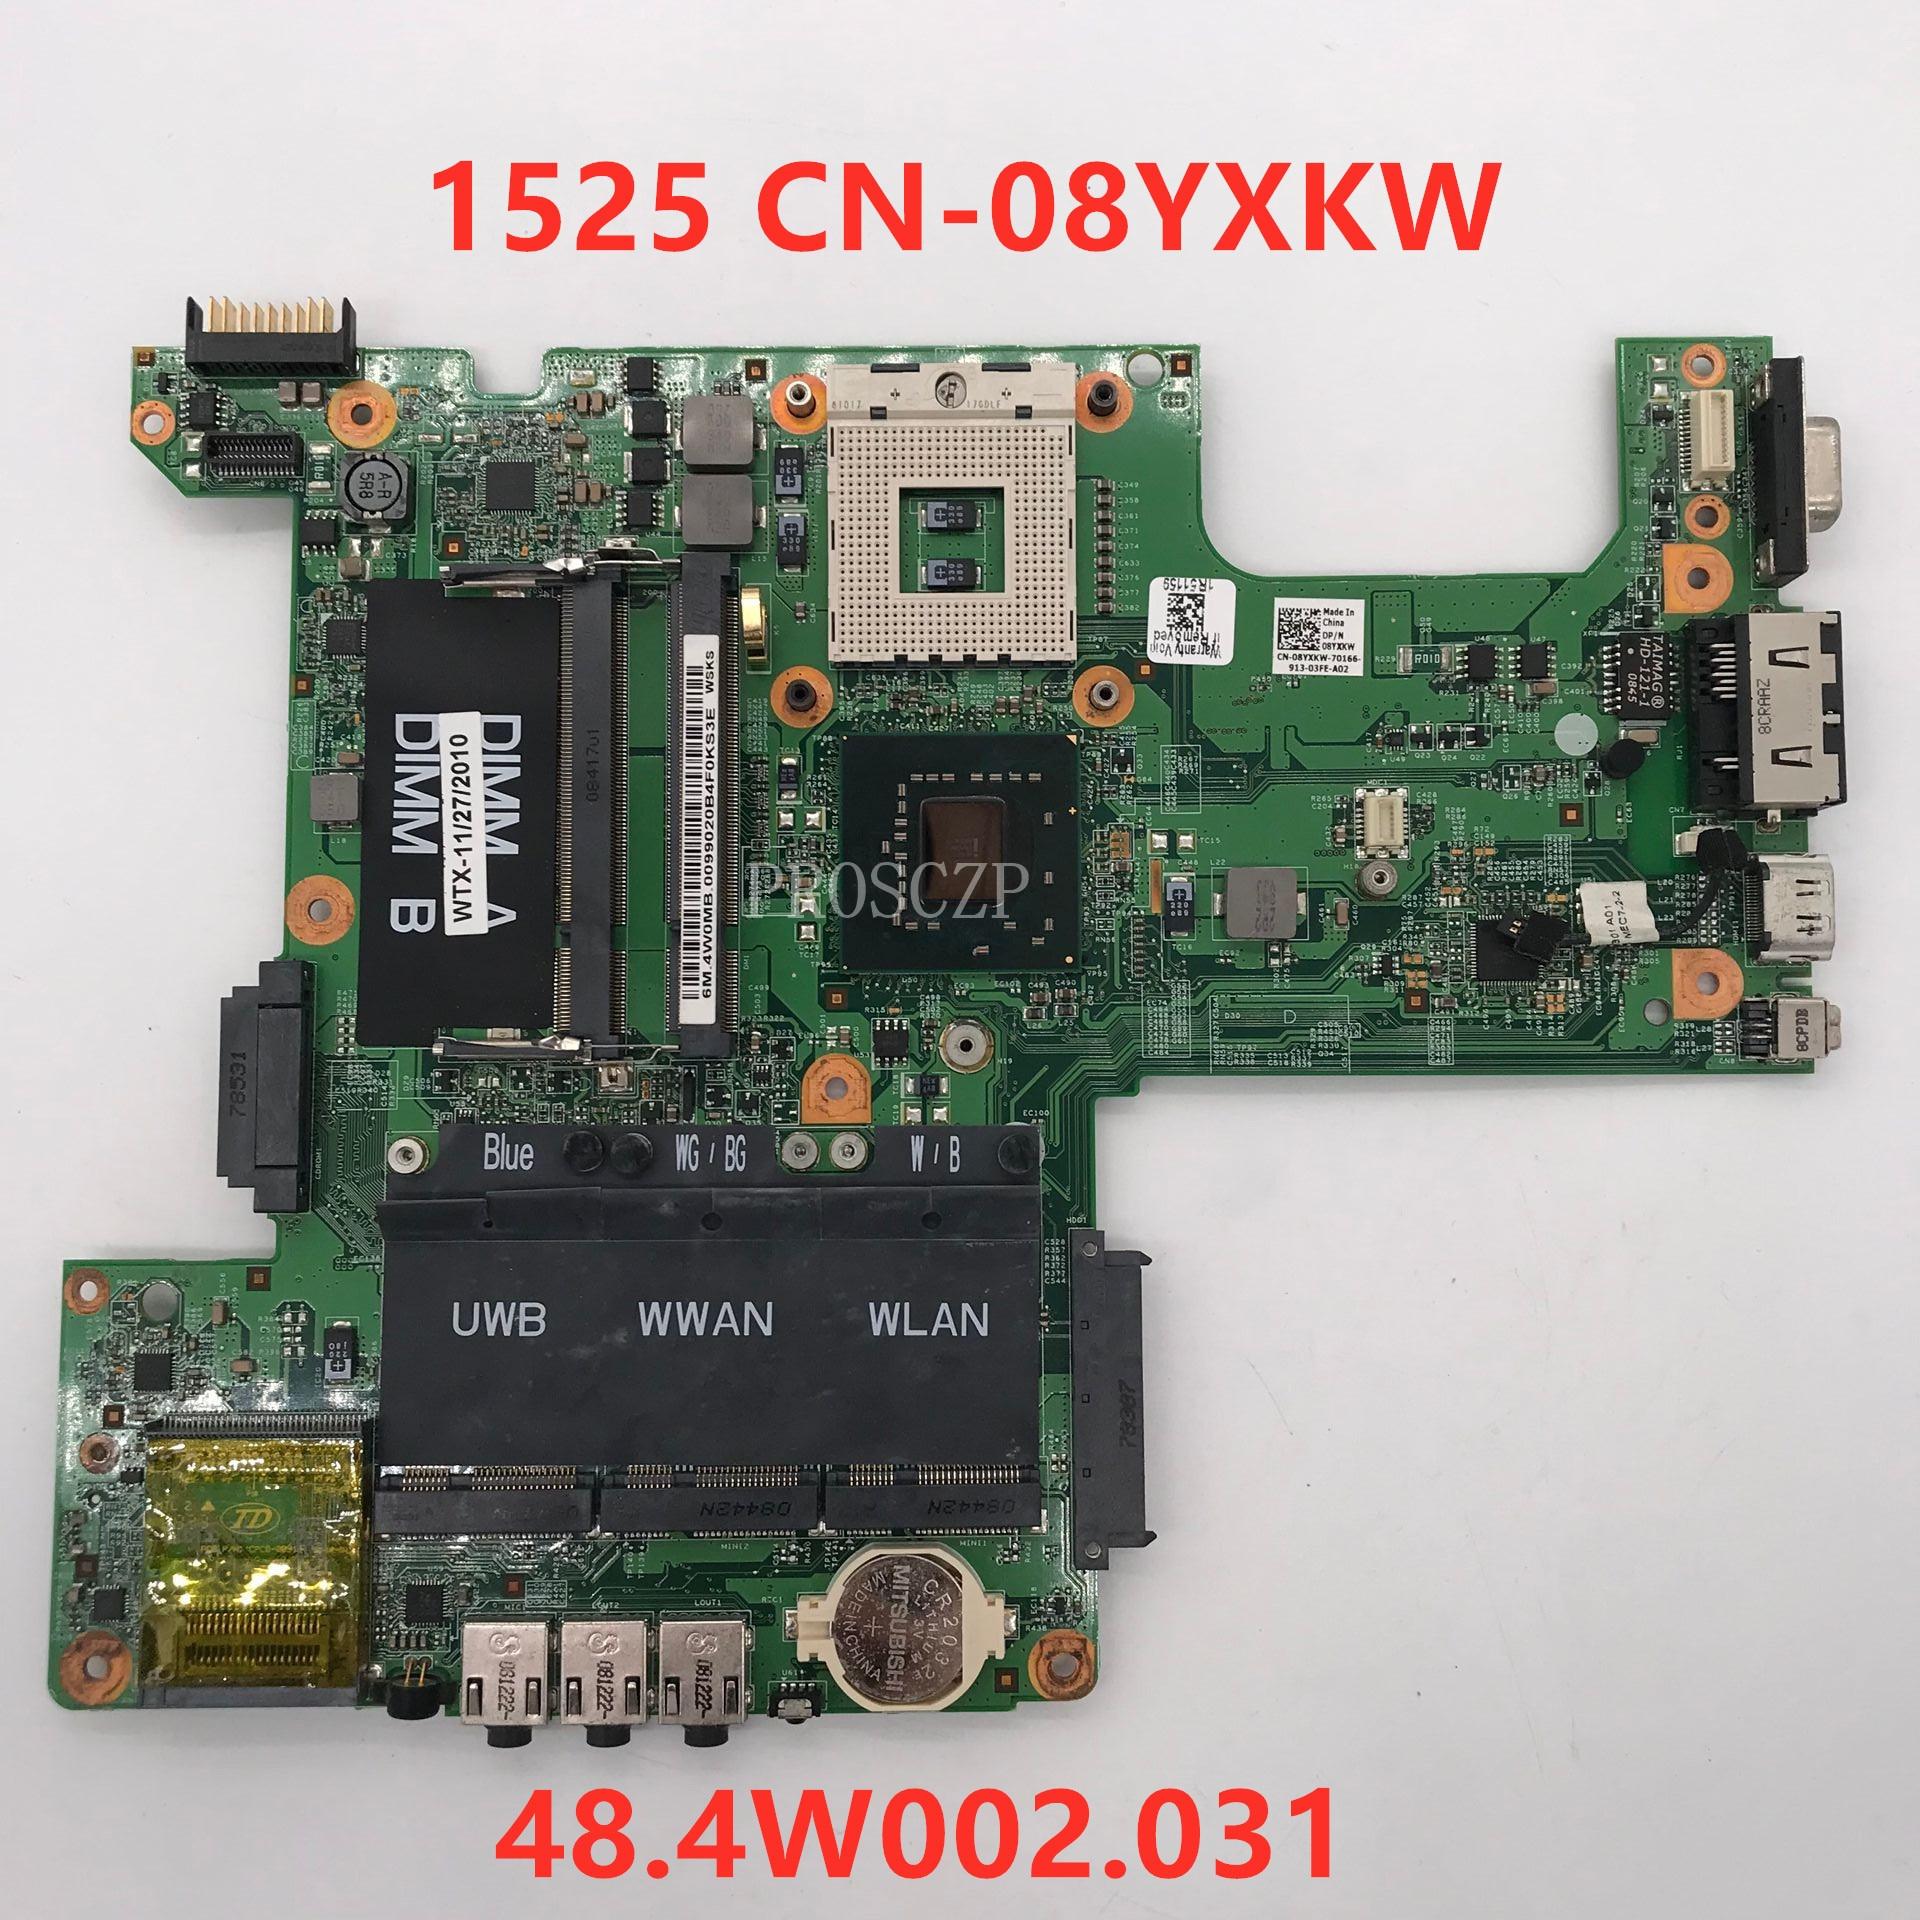 Envío Gratis 1525 placa base de computadora portátil CN-08YXKW 08YXKW 8YXKW 07211-3 48.4W002.031 100% trabajando bien